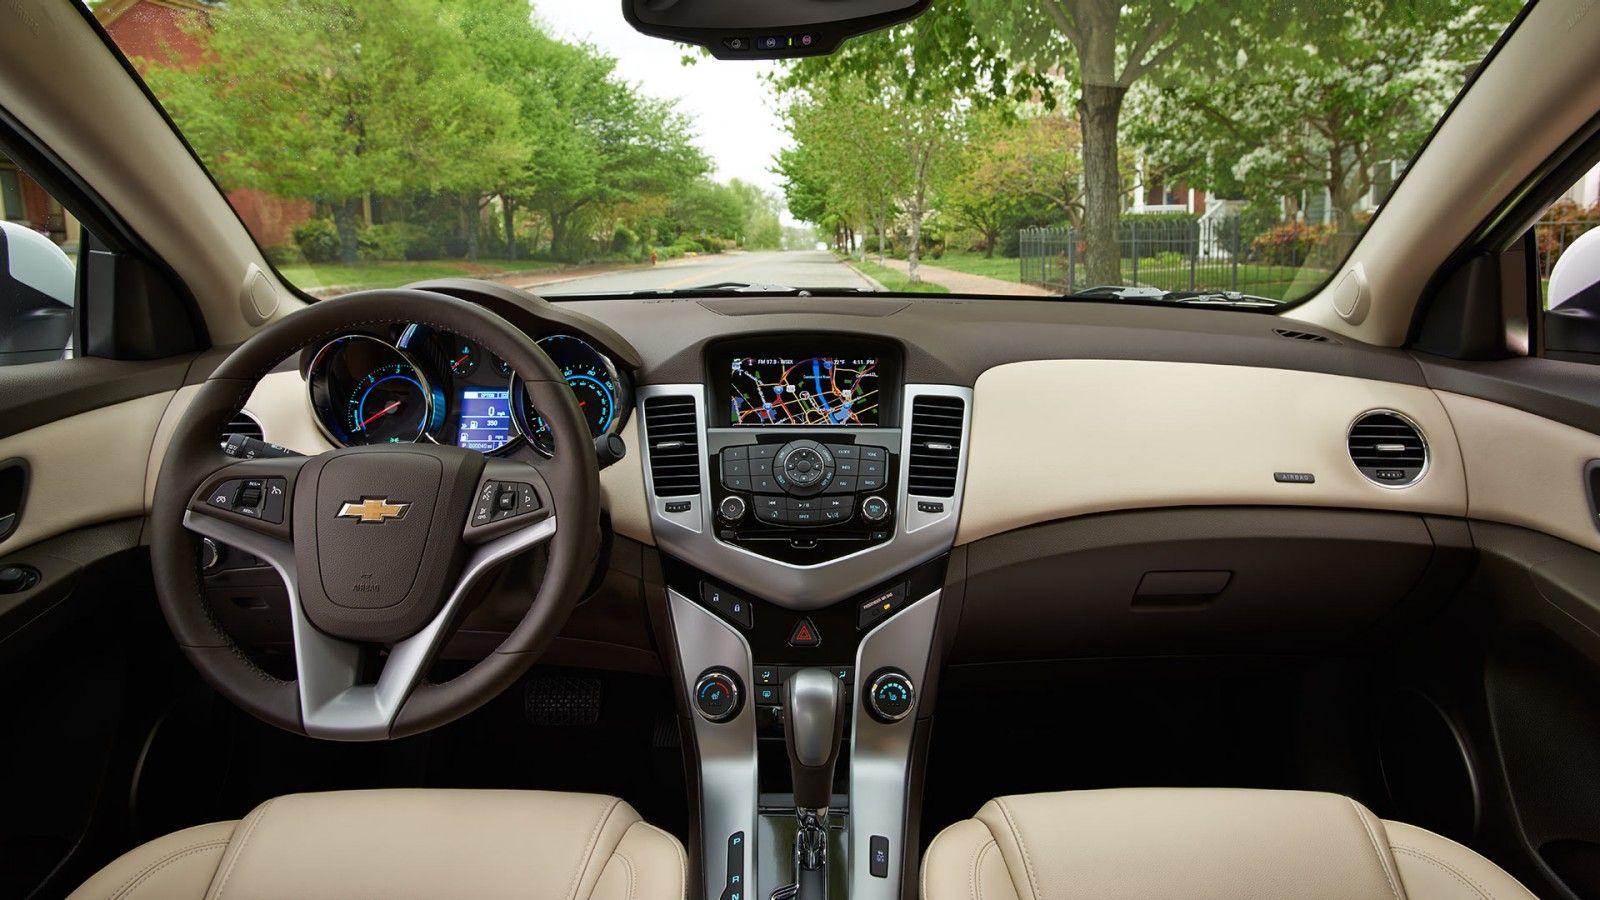 Light Cocoa Chevy Cruze Chevrolet Cruze Cruze